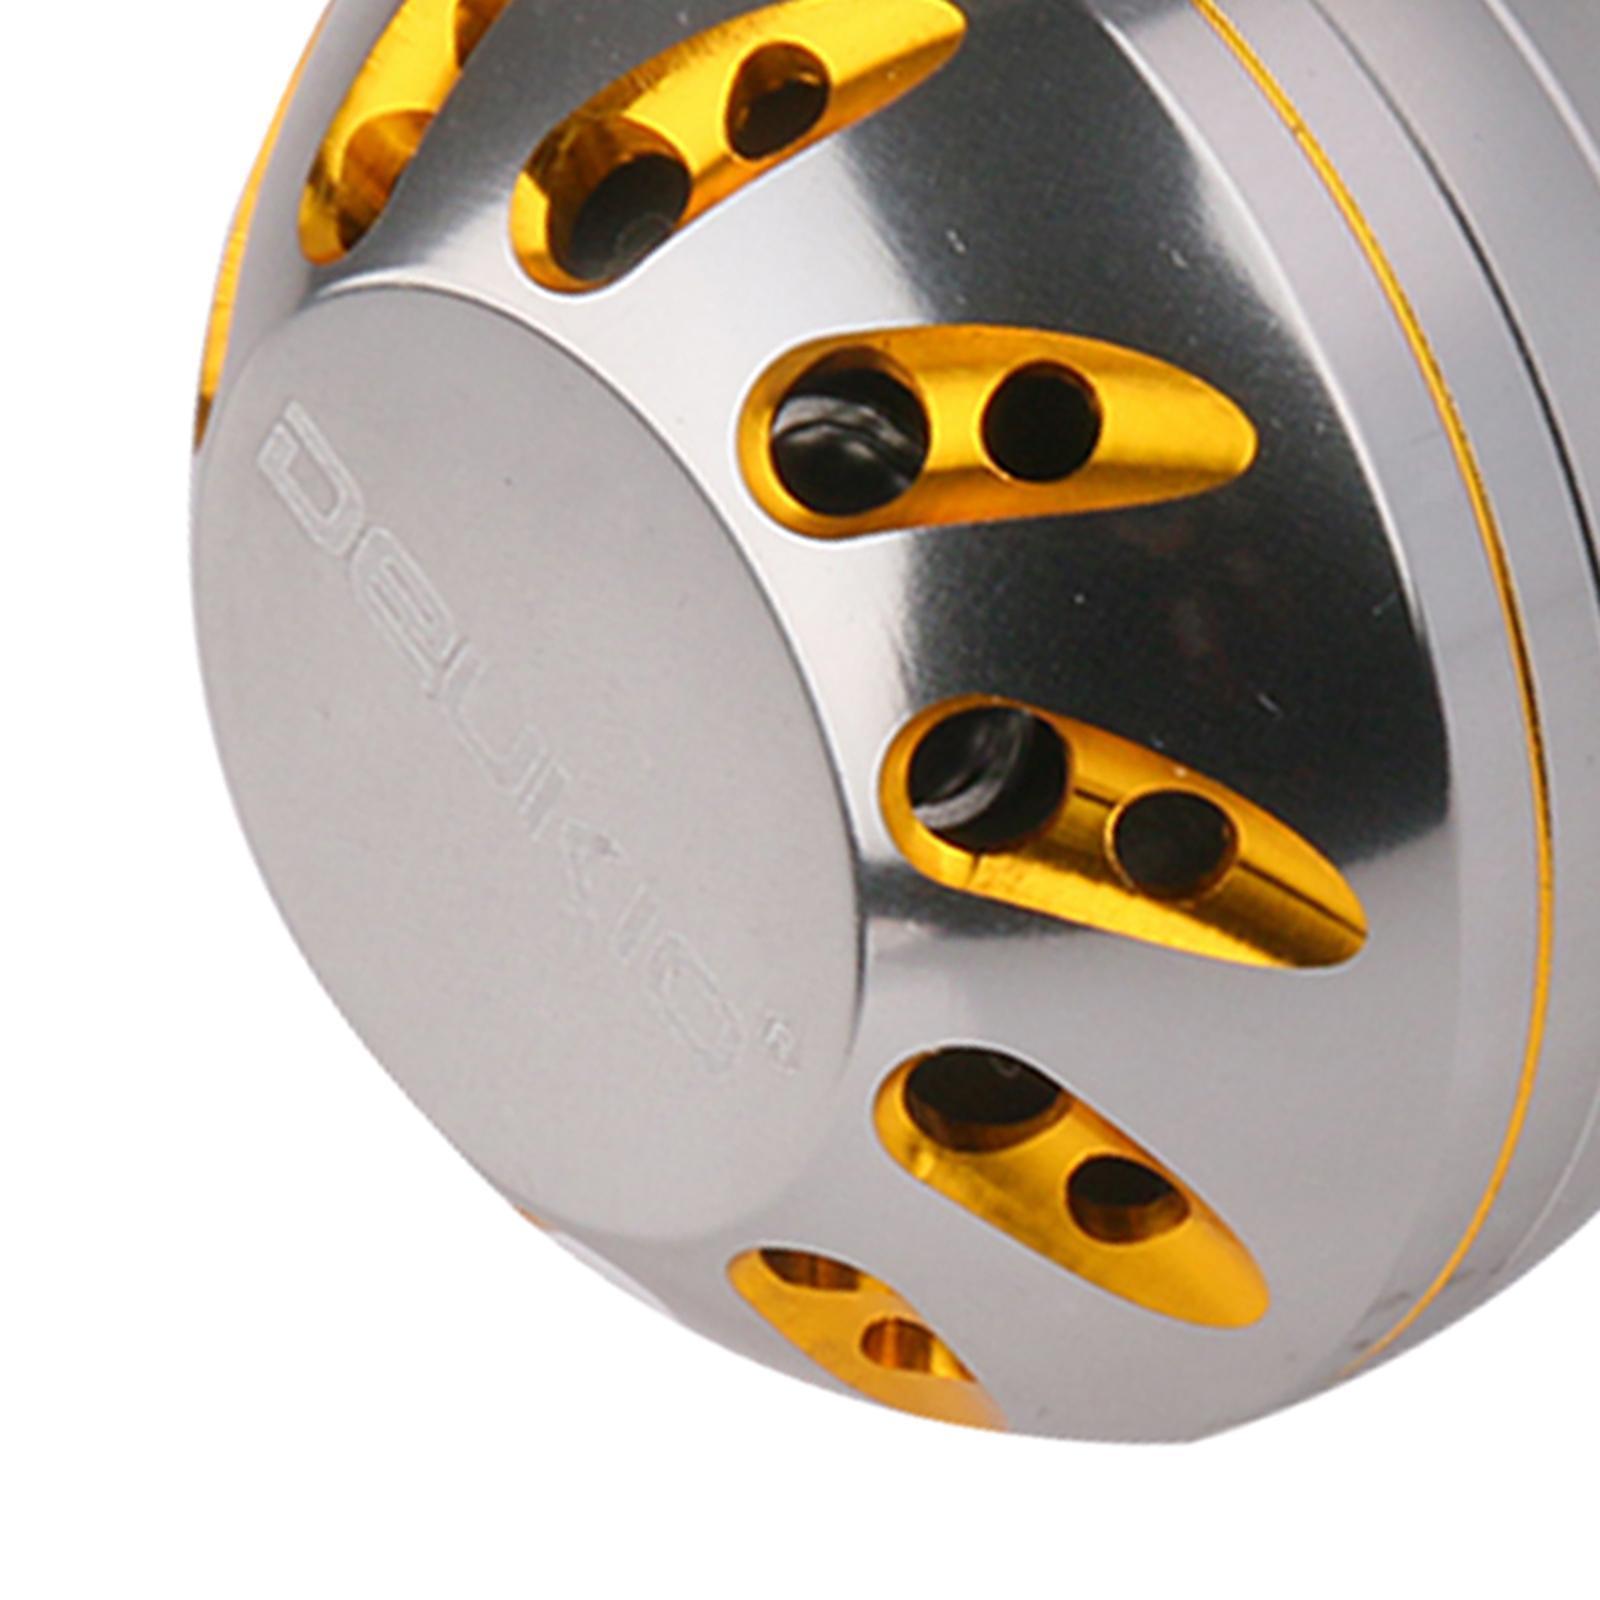 Full Metal Fishing Reel Handle Power Knob w// 2 Ball Bearings 45mm Fishing Tackle